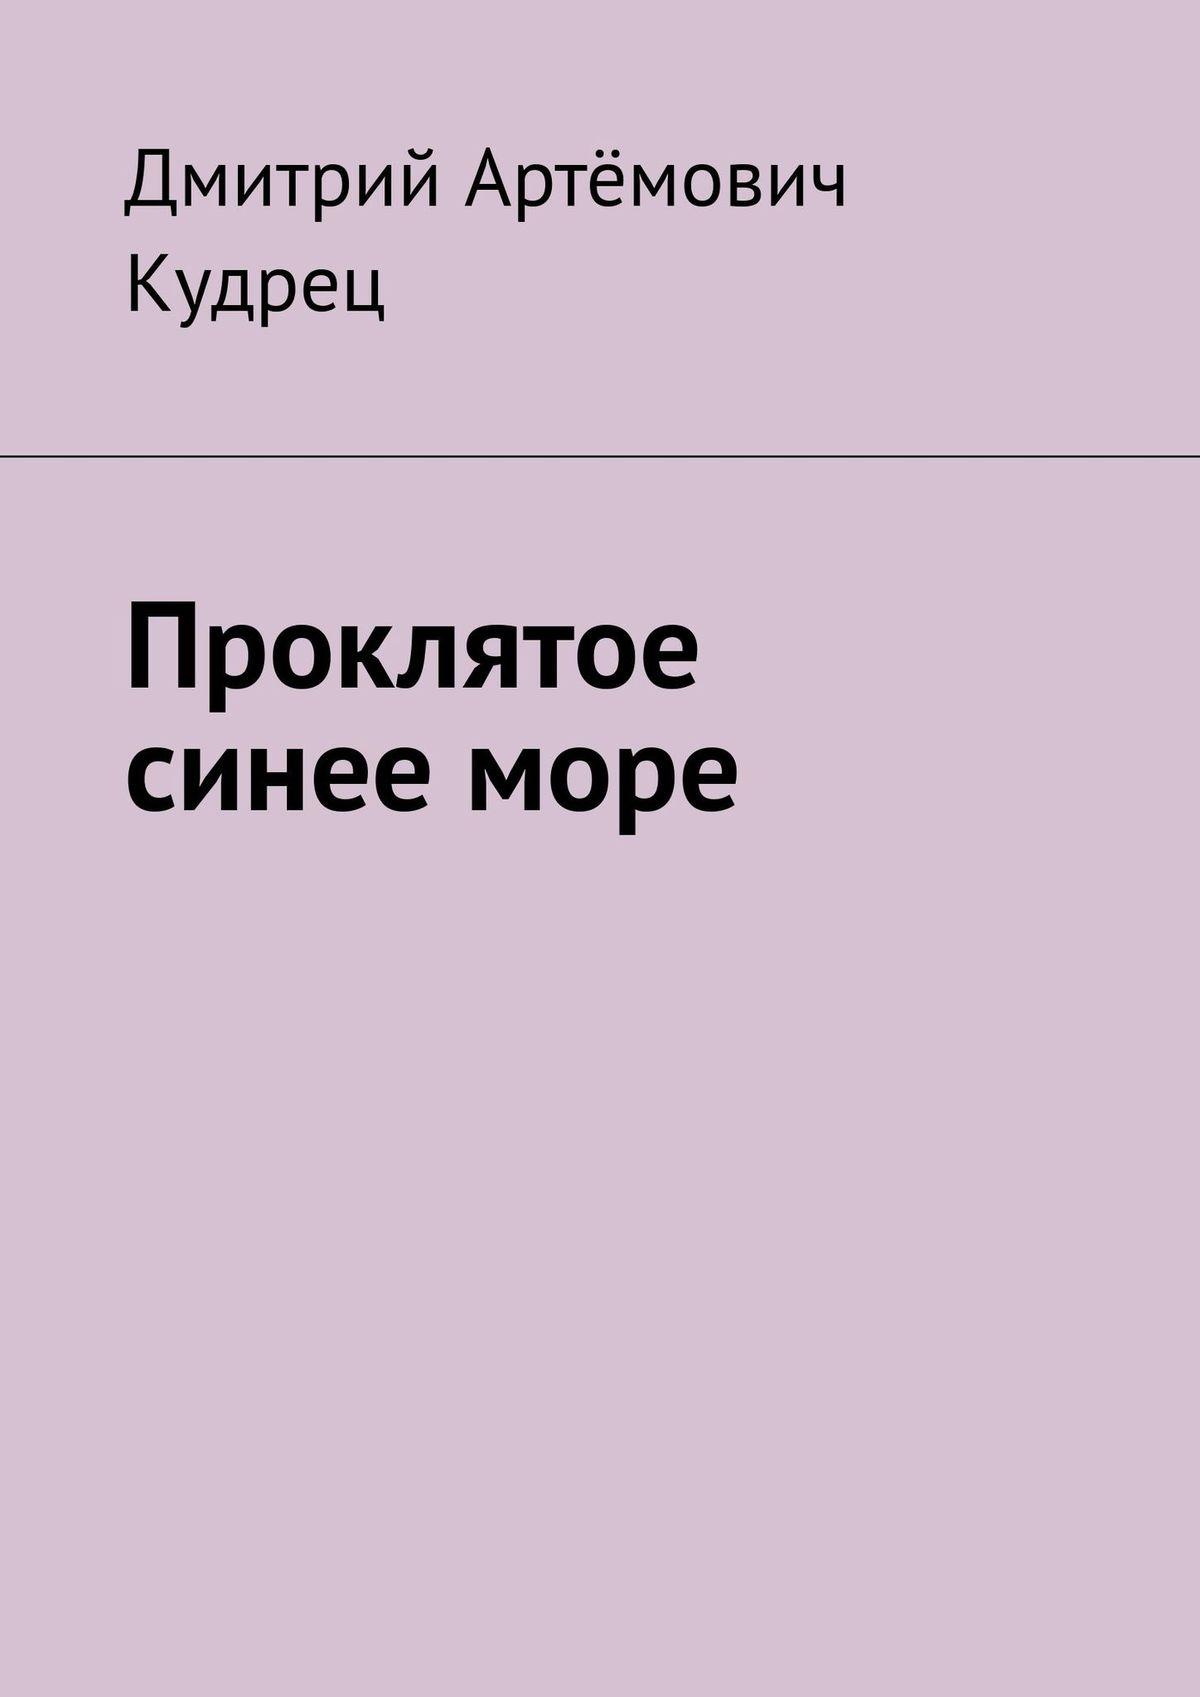 Дмитрий Артёмович Кудрец Проклятое синееморе дмитрий кудрец весёлый новый год